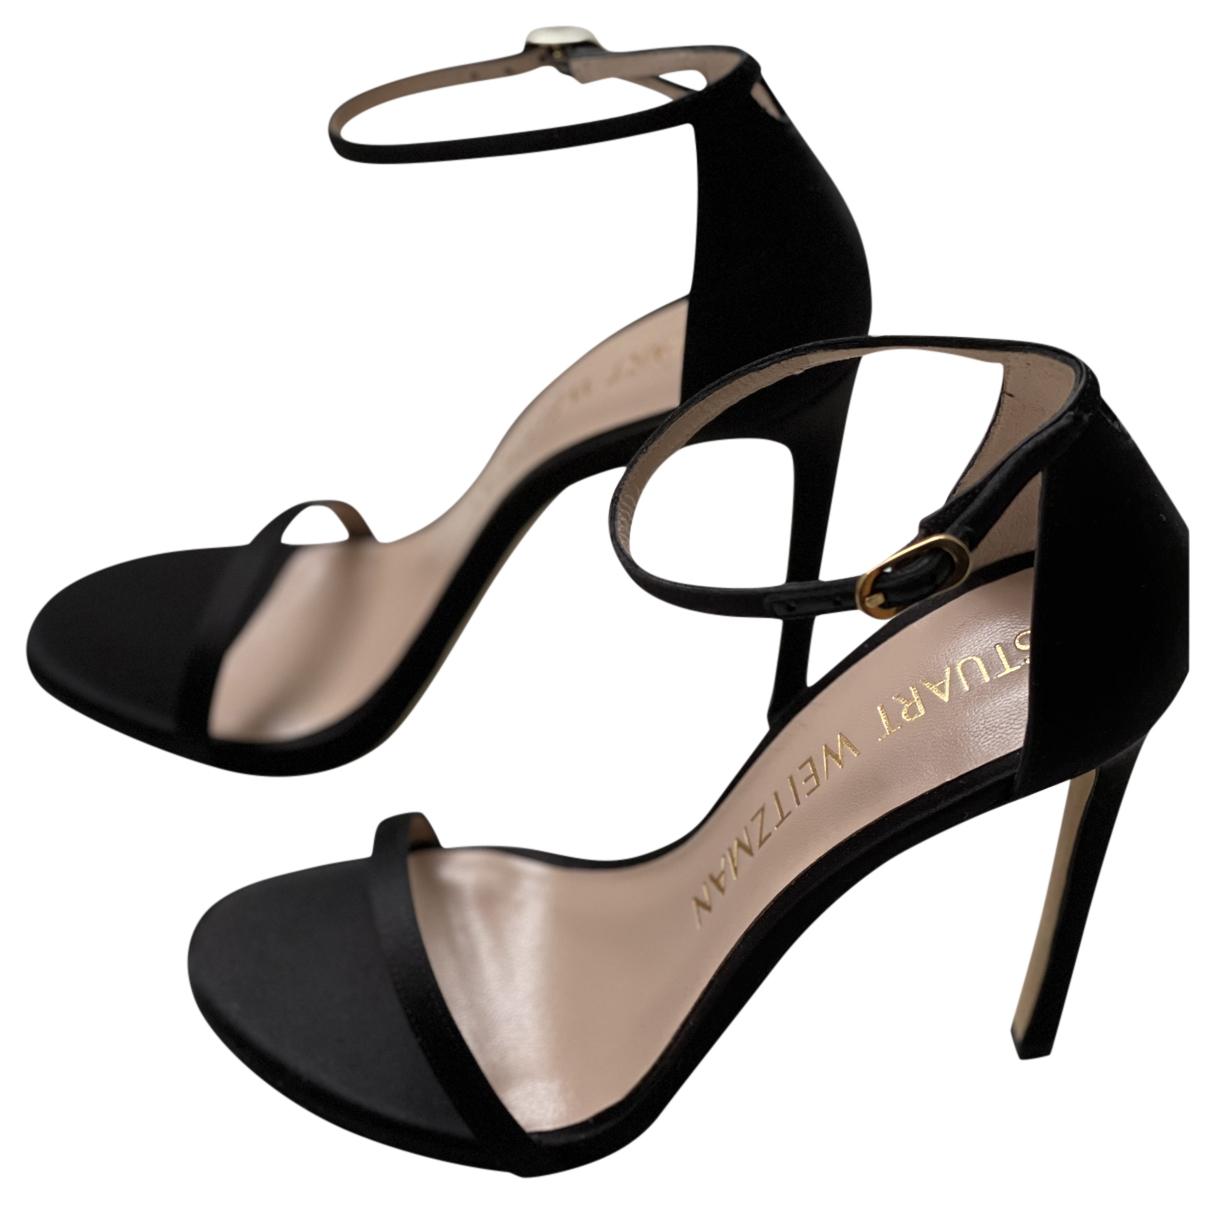 Stuart Weitzman N Black Cloth Sandals for Women 38 EU